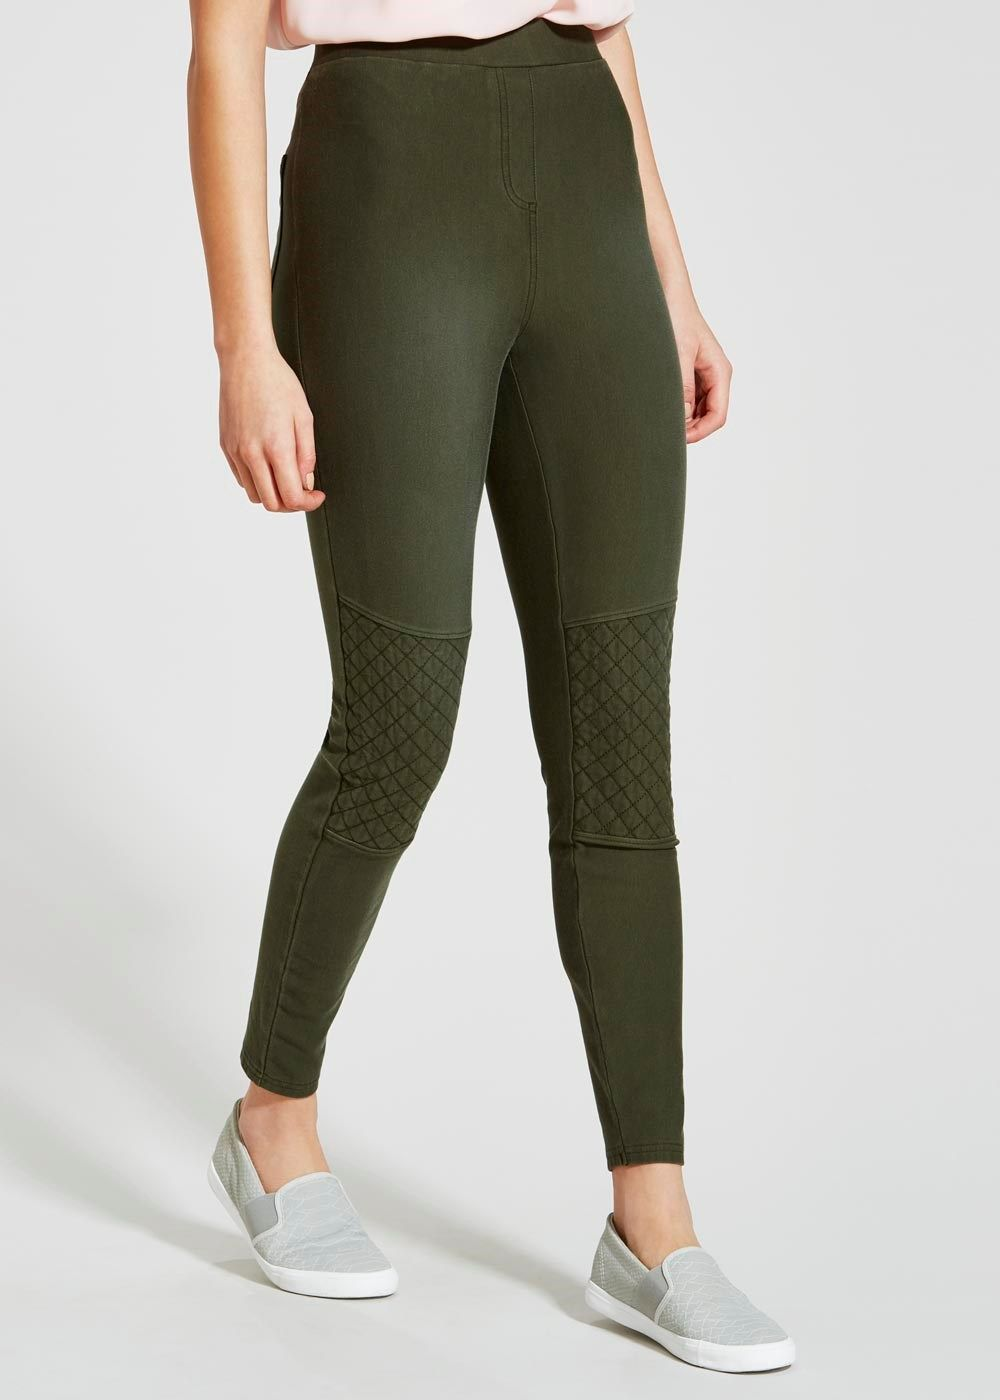 e2049928375061 Biker Panel Leggings | Fashion | Leggings, Fashion, Biker